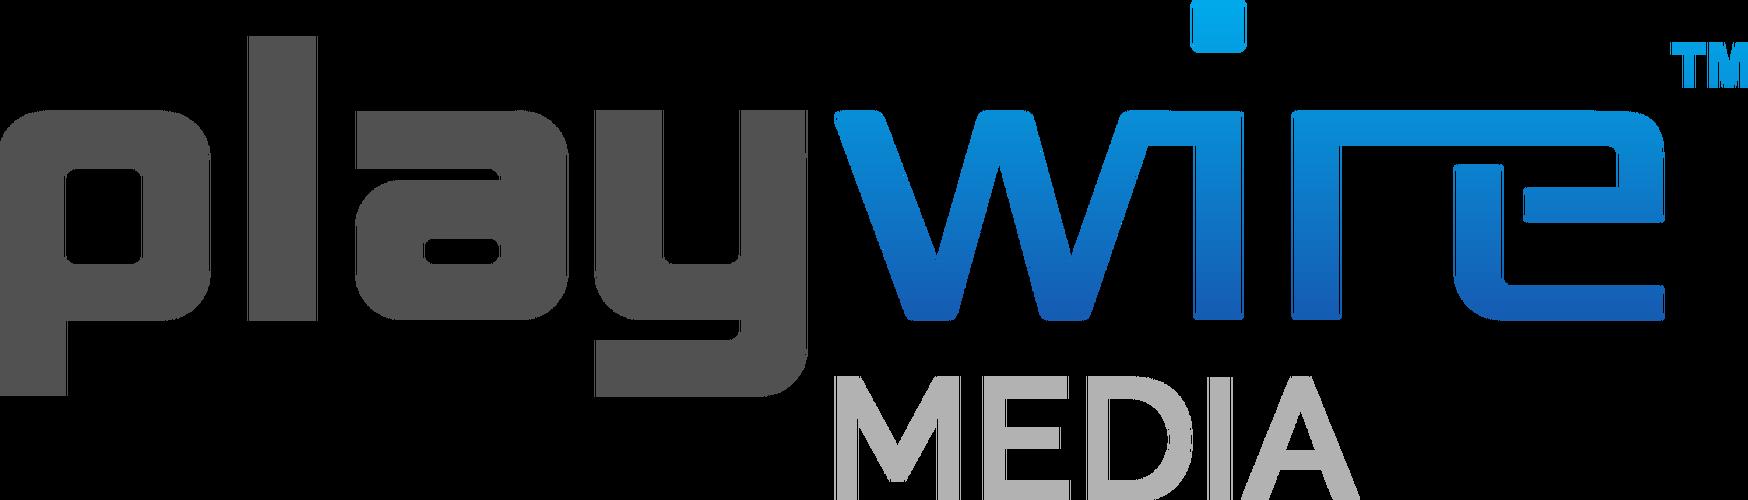 Playwire Media